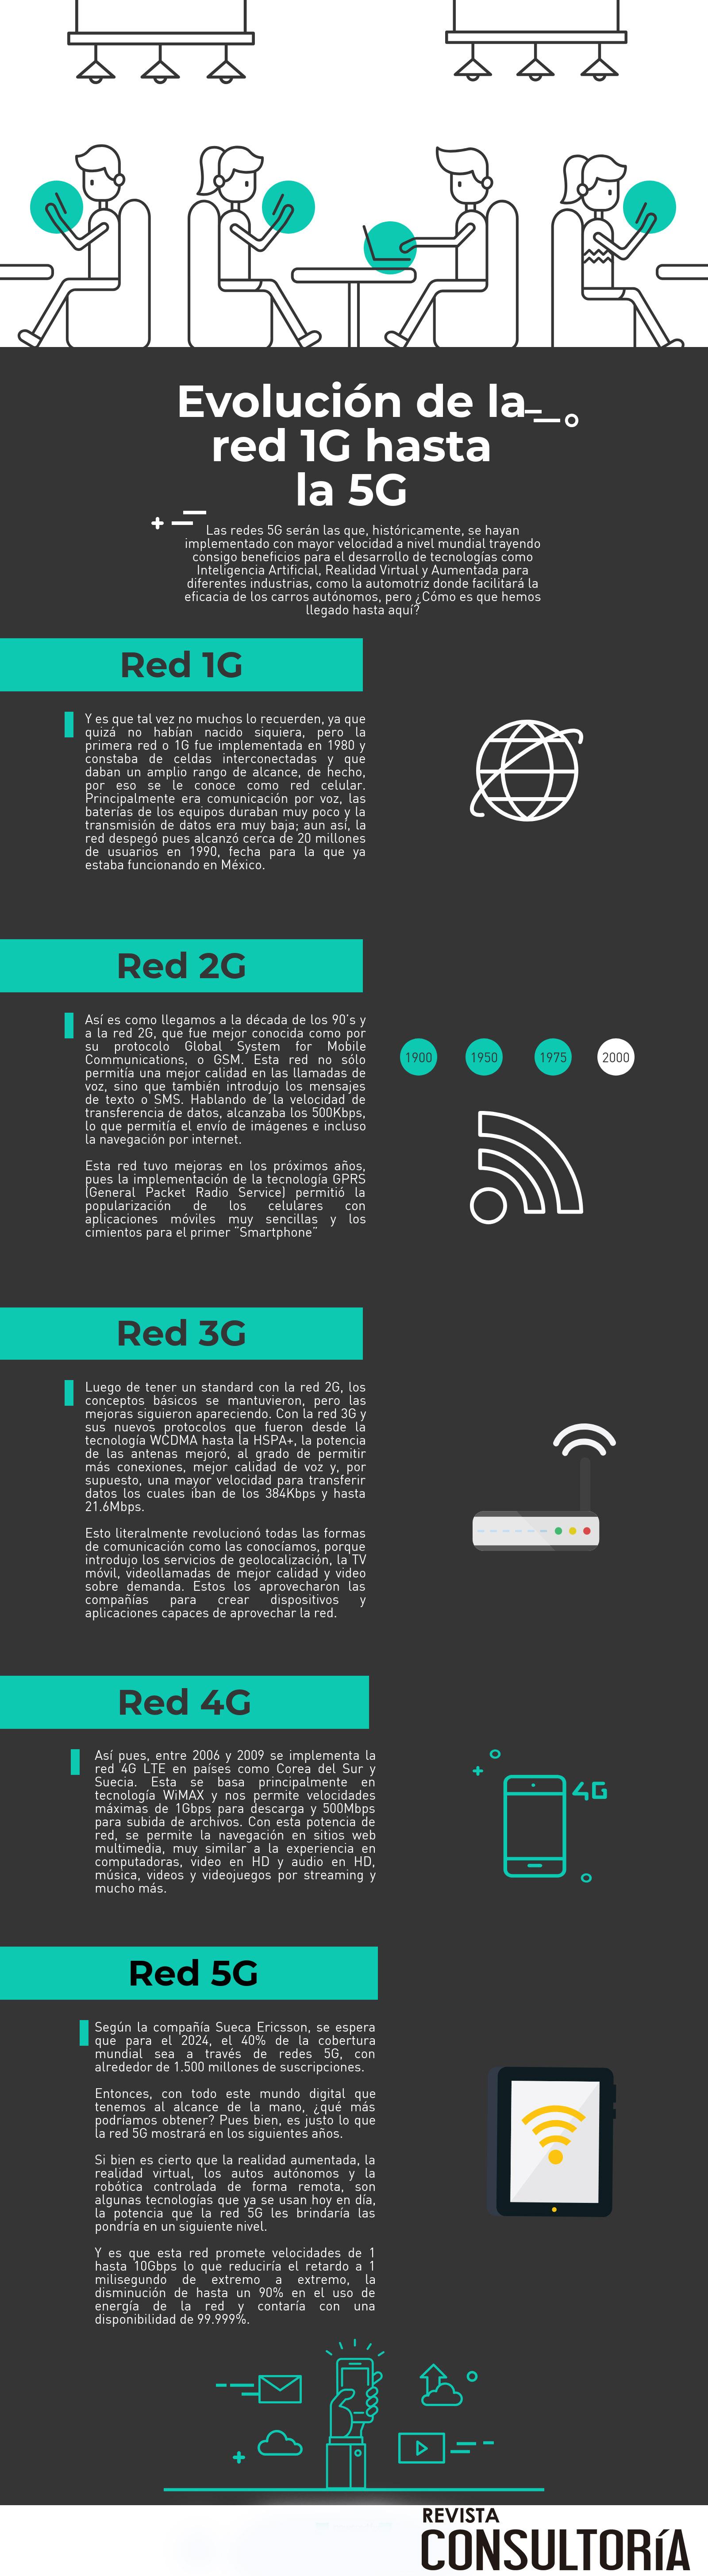 infografia evolucion de la red 5g 1 - Evolución de la red 1G hasta la 5G